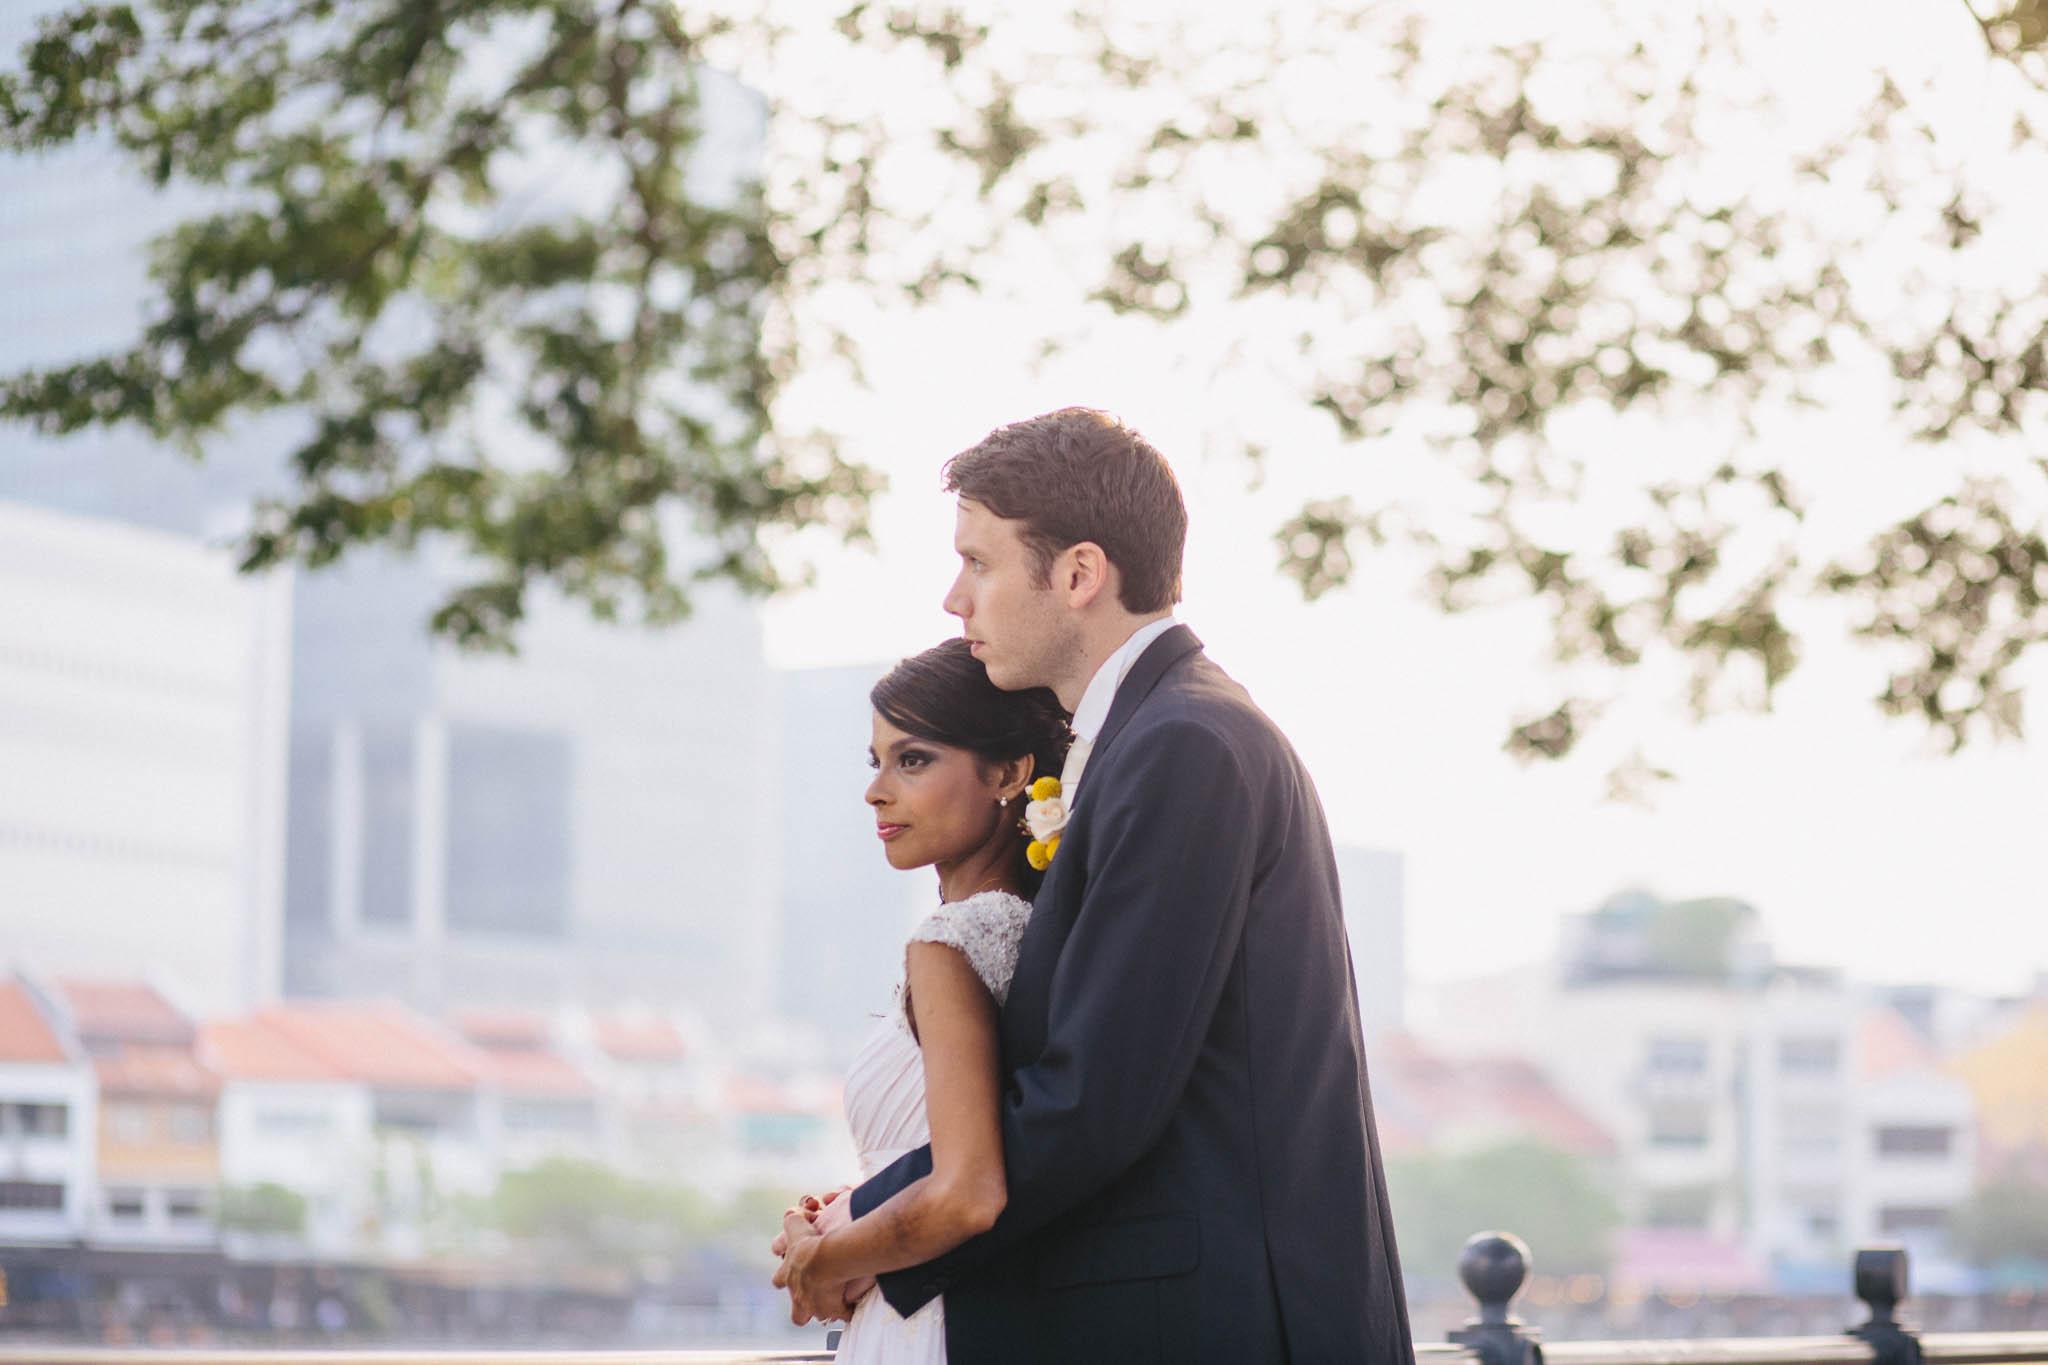 singapore-wedding-photographer-malay-indian-pre-wedding-travel-wmt-2015-43.jpg